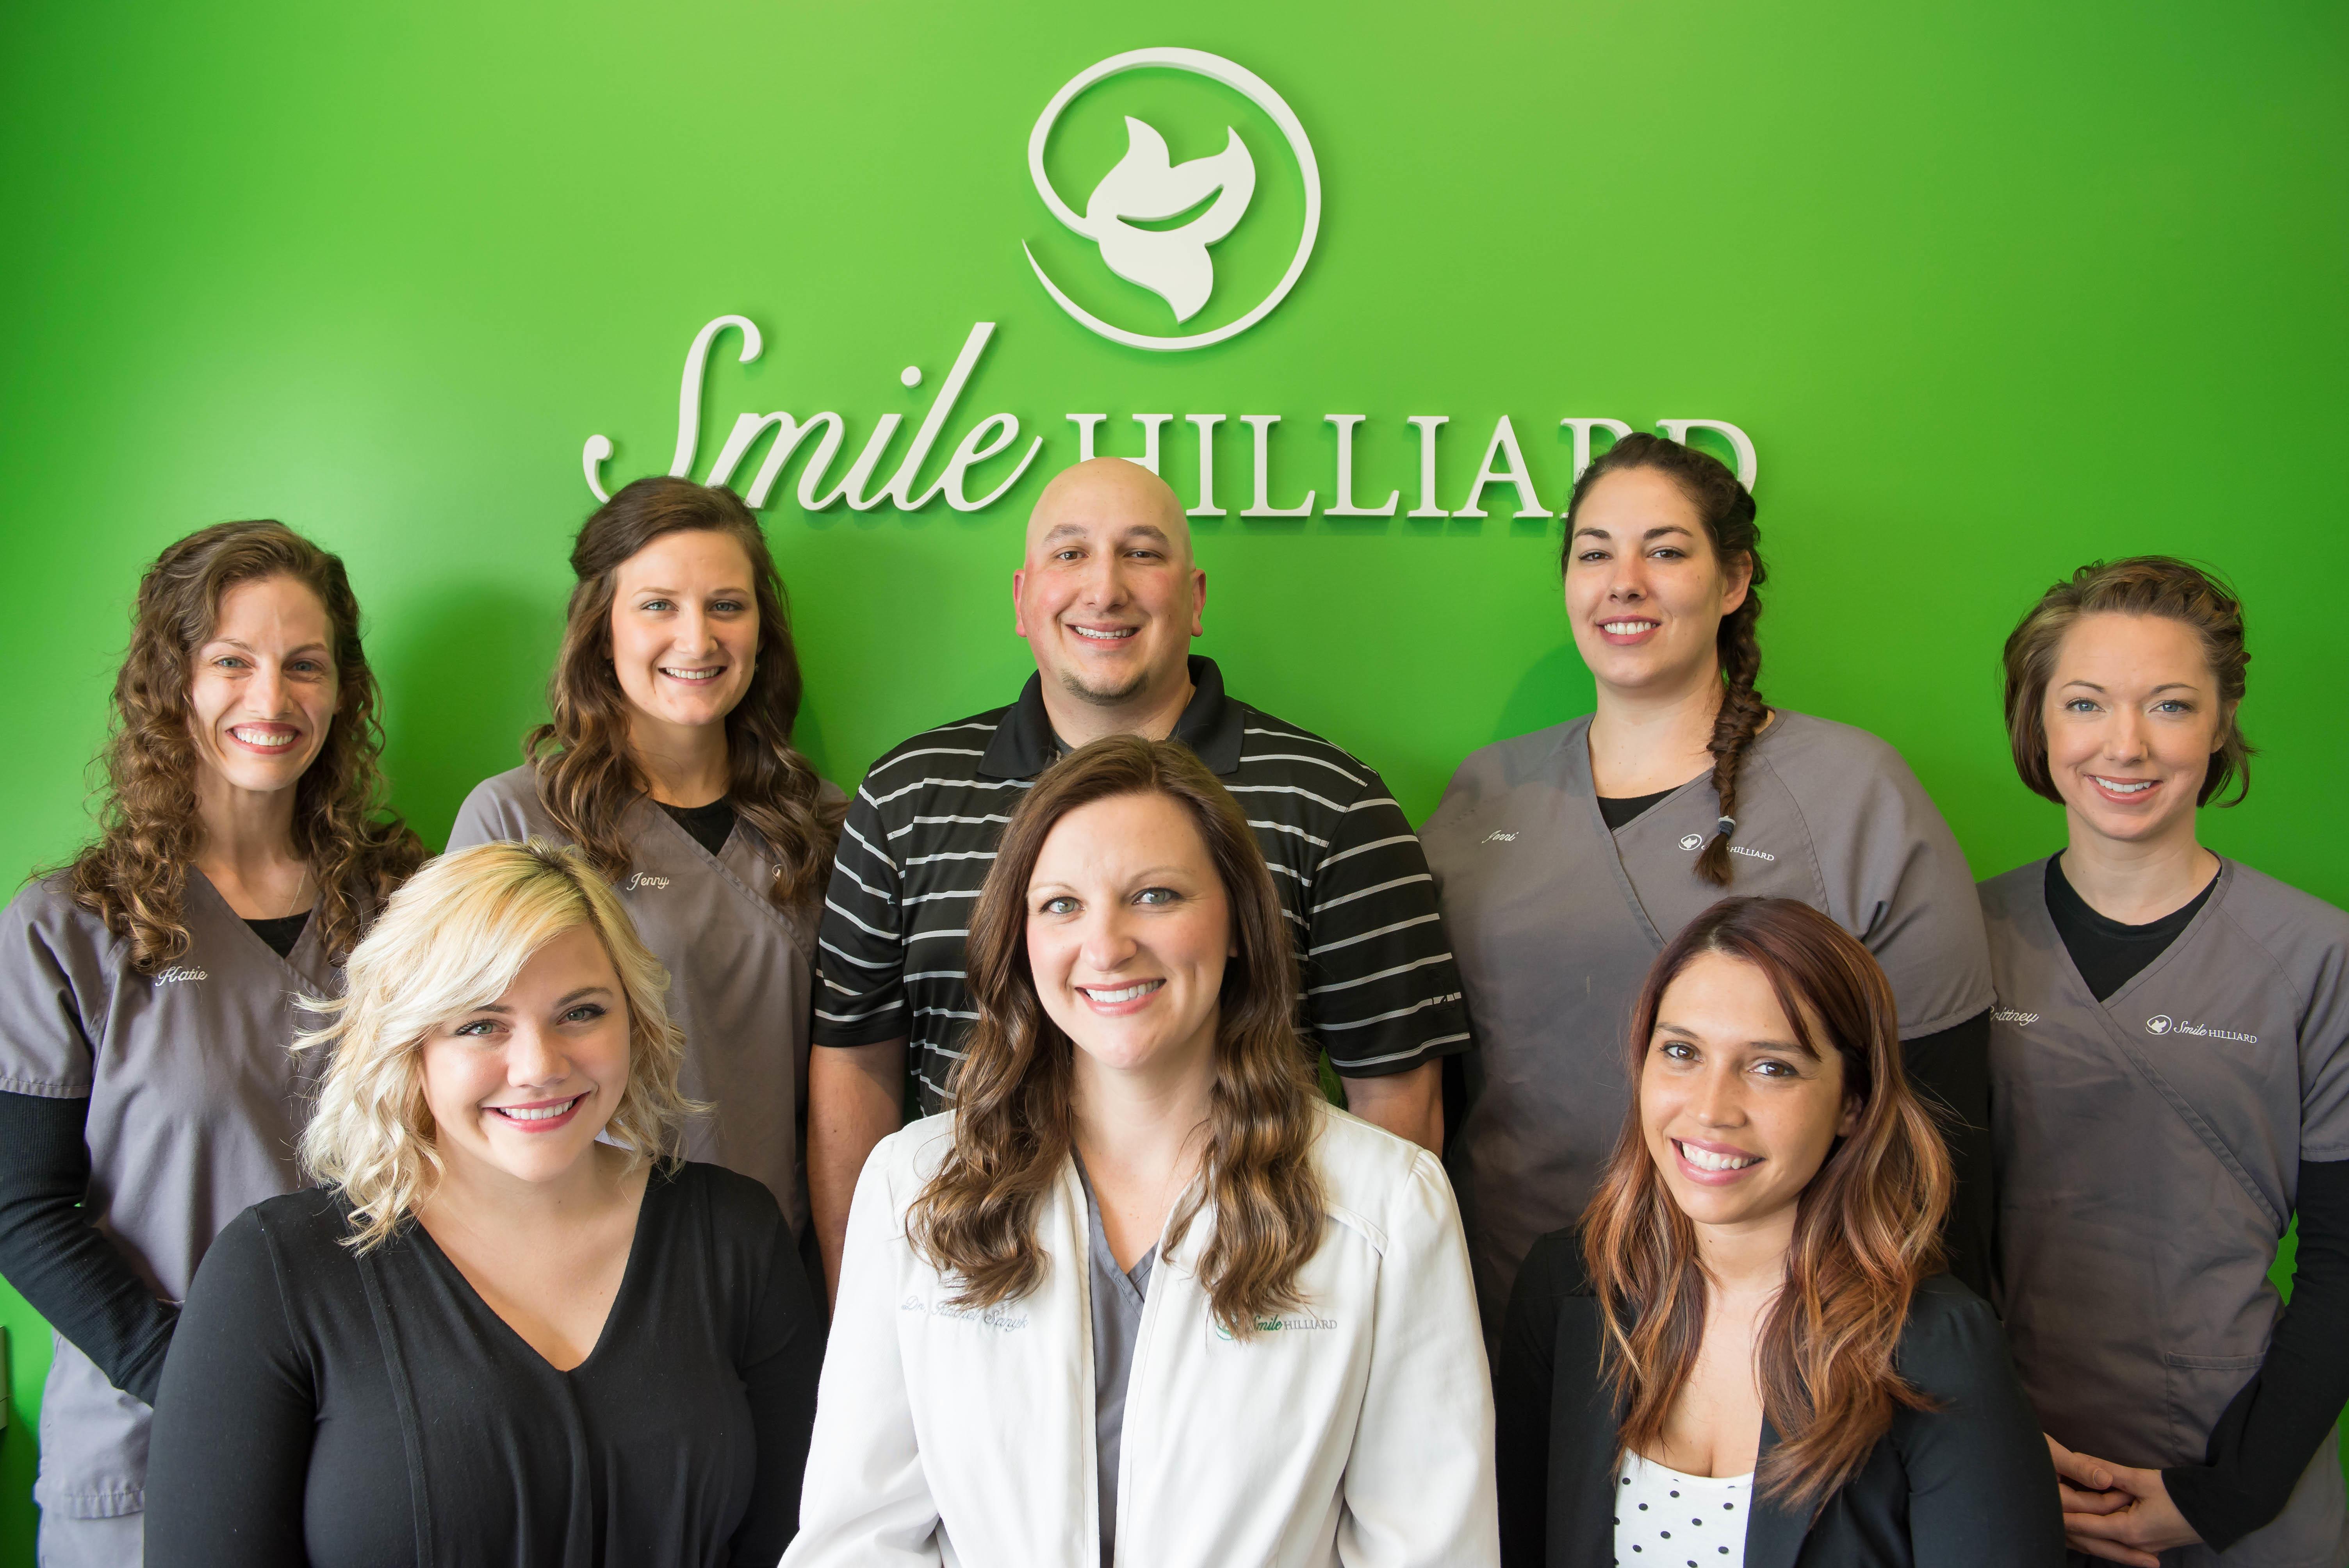 Smile Hilliard image 3